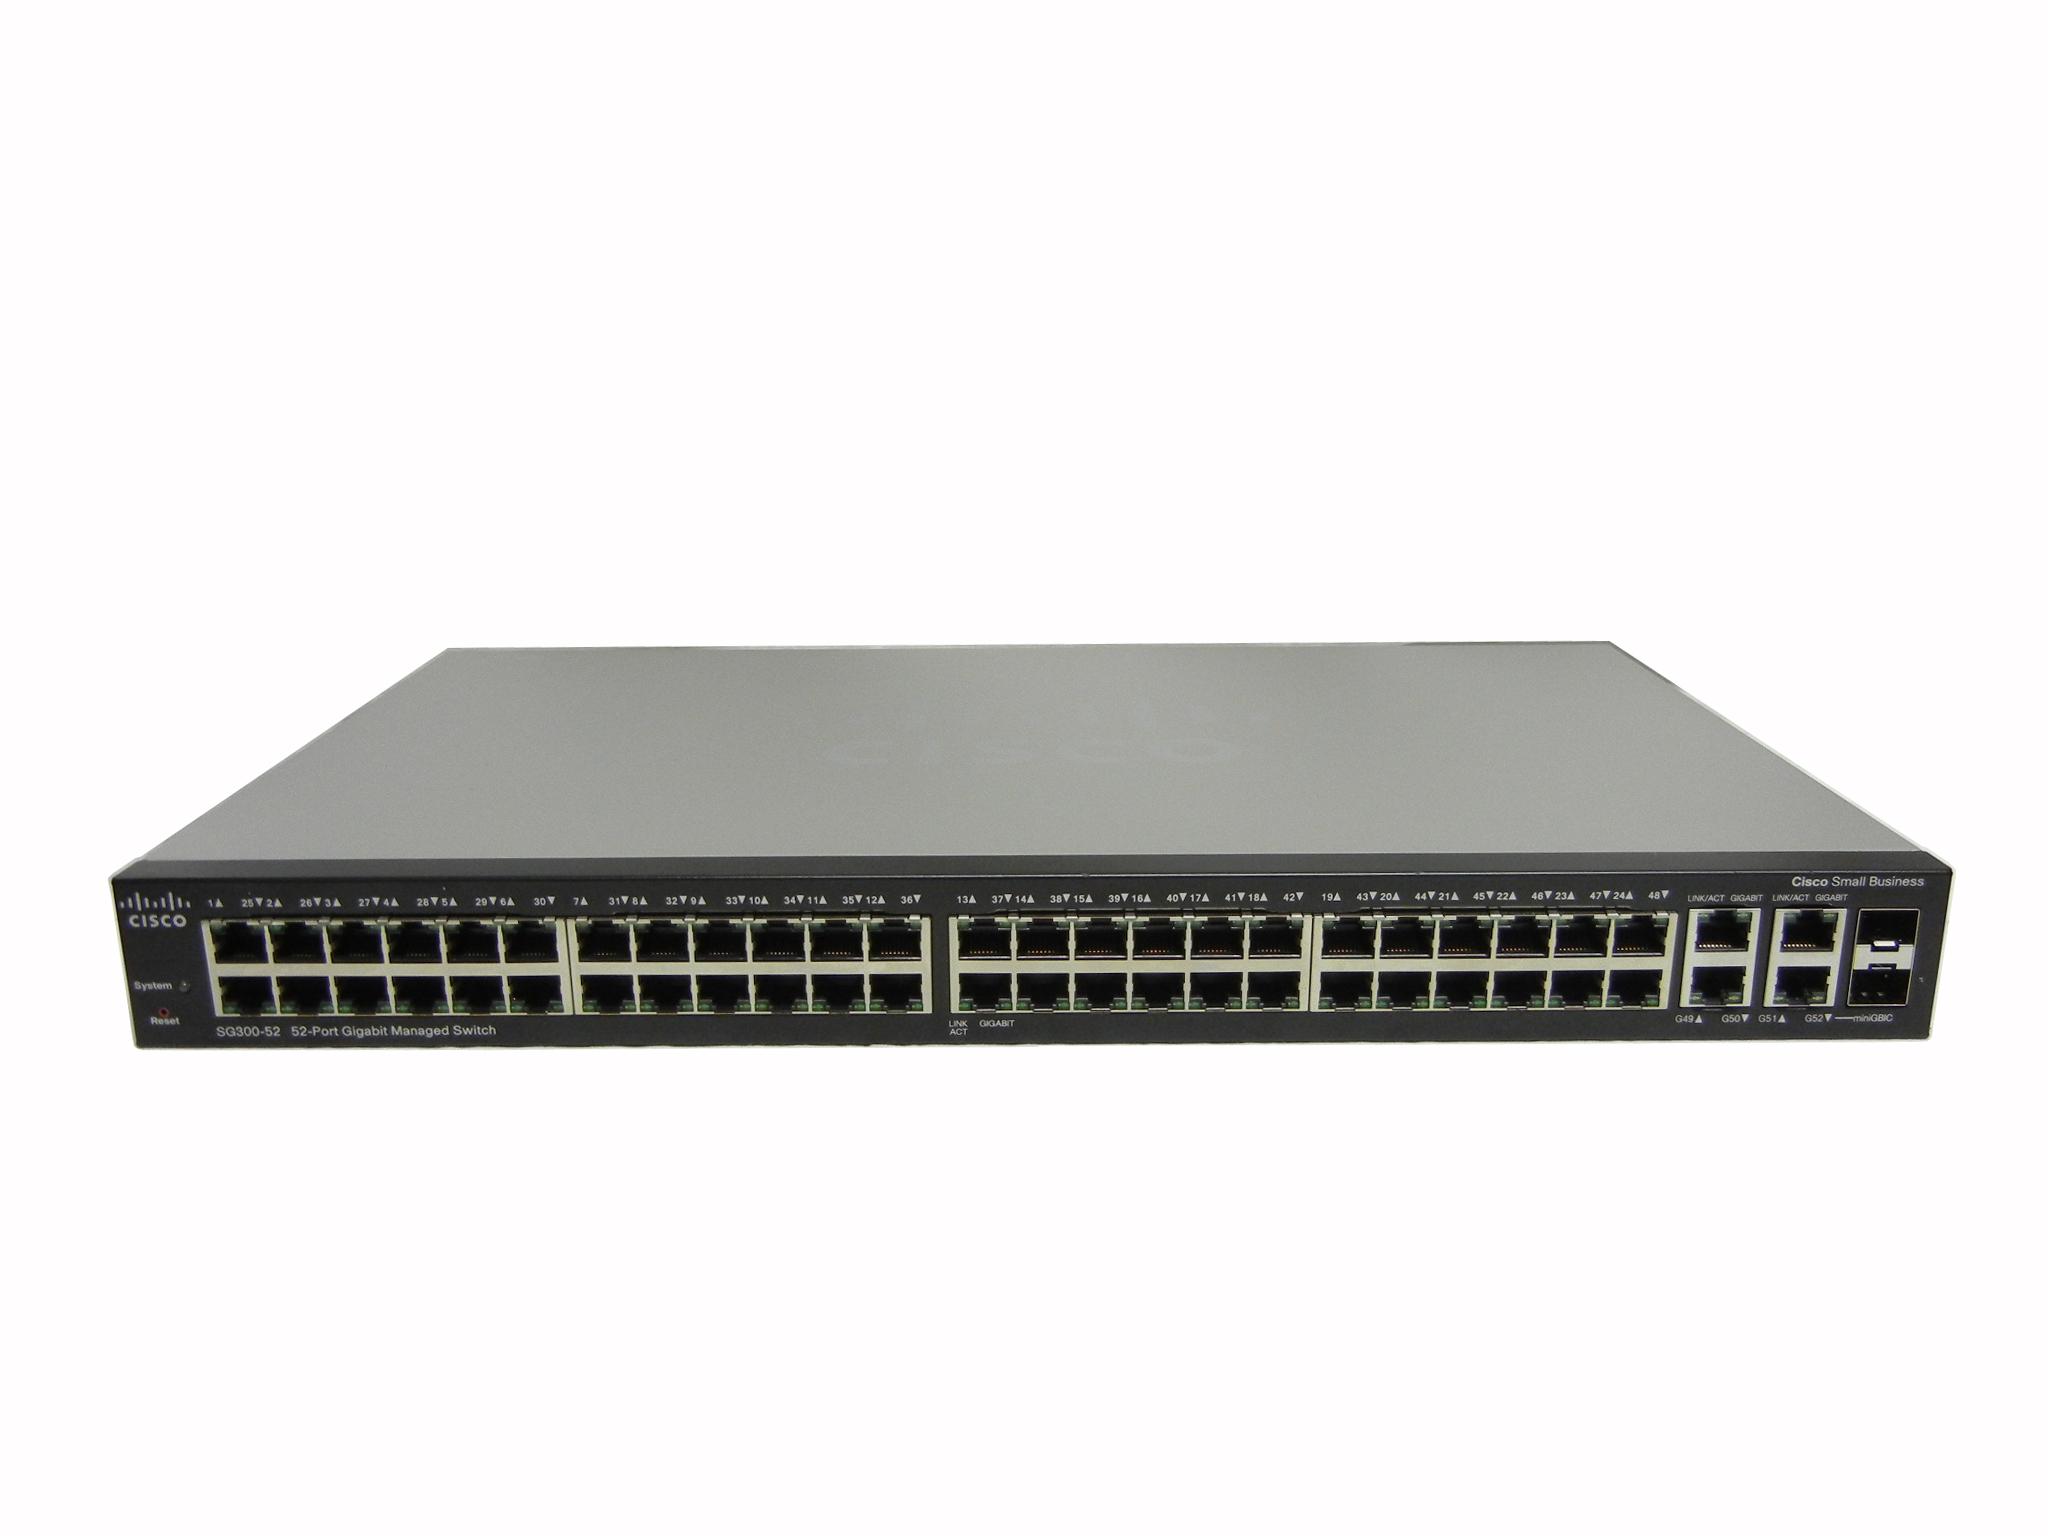 【中古】Cisco SG300-52-JP